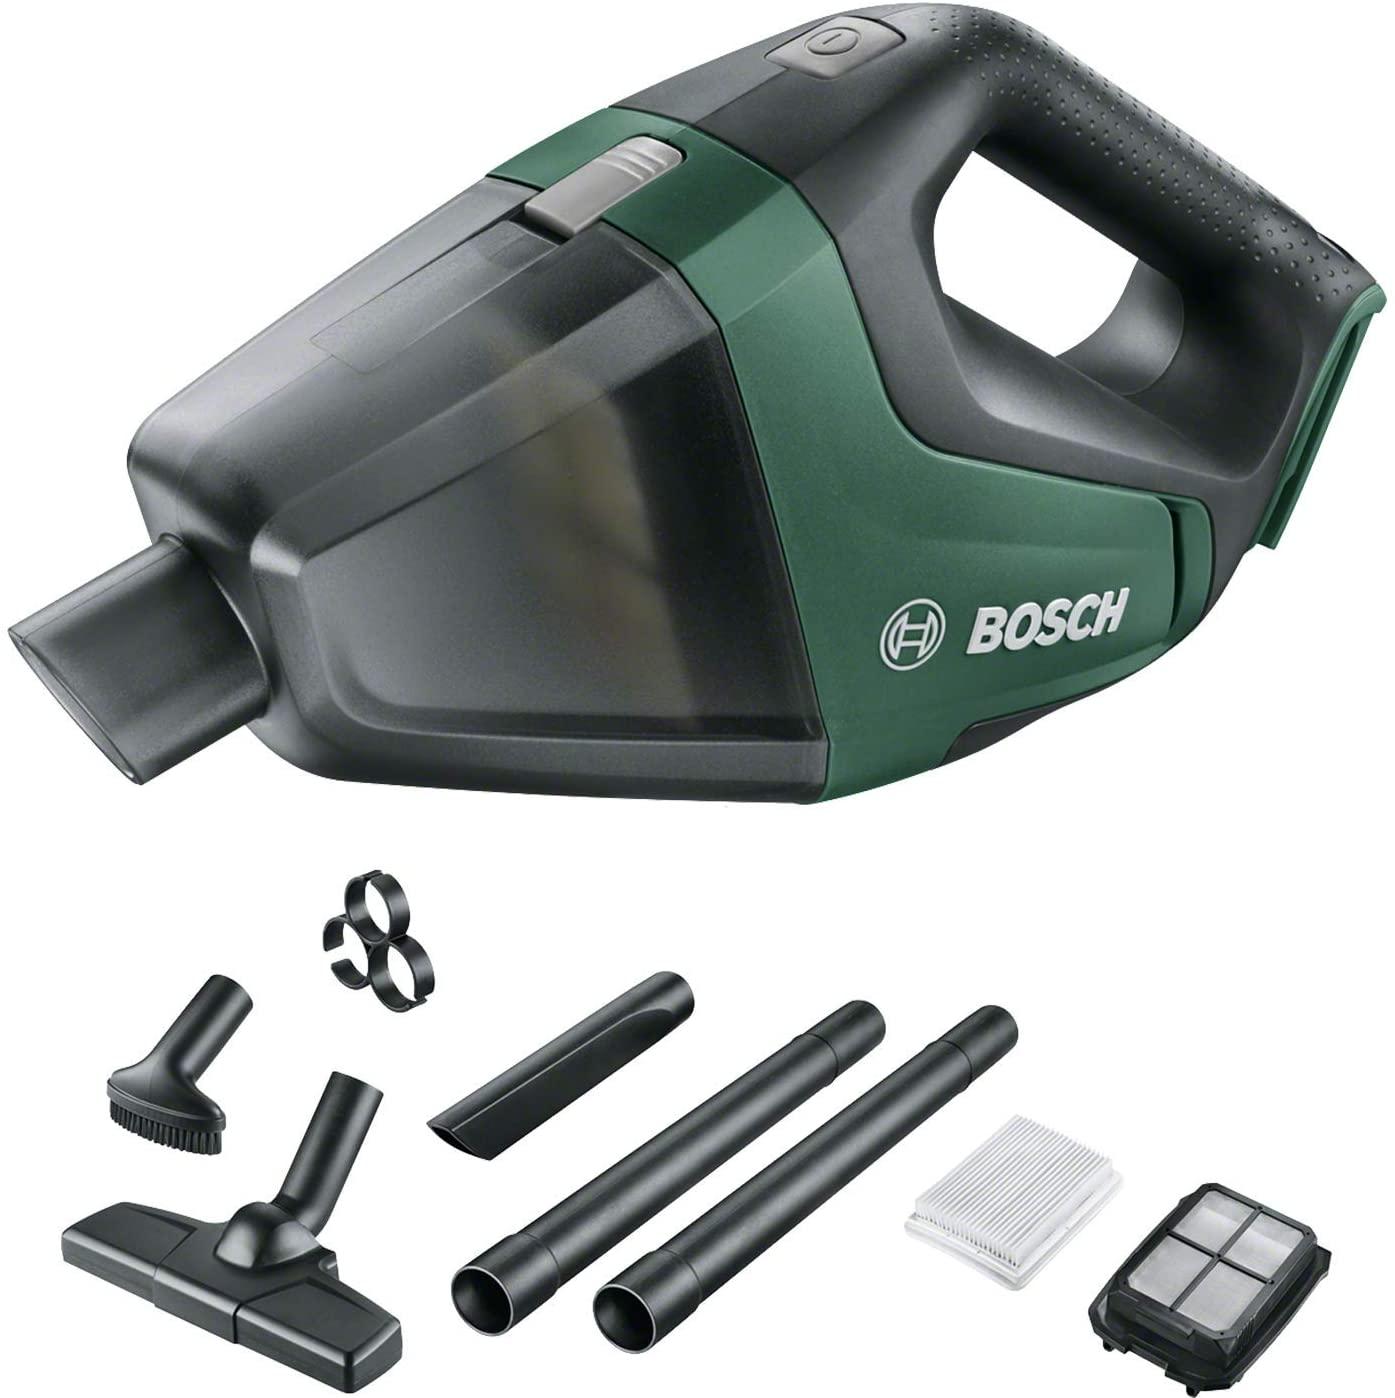 [Amazon UK] Bosch Cordless Vacuum Cleaner Set UniversalVac 18 (Without Battery, 18V)